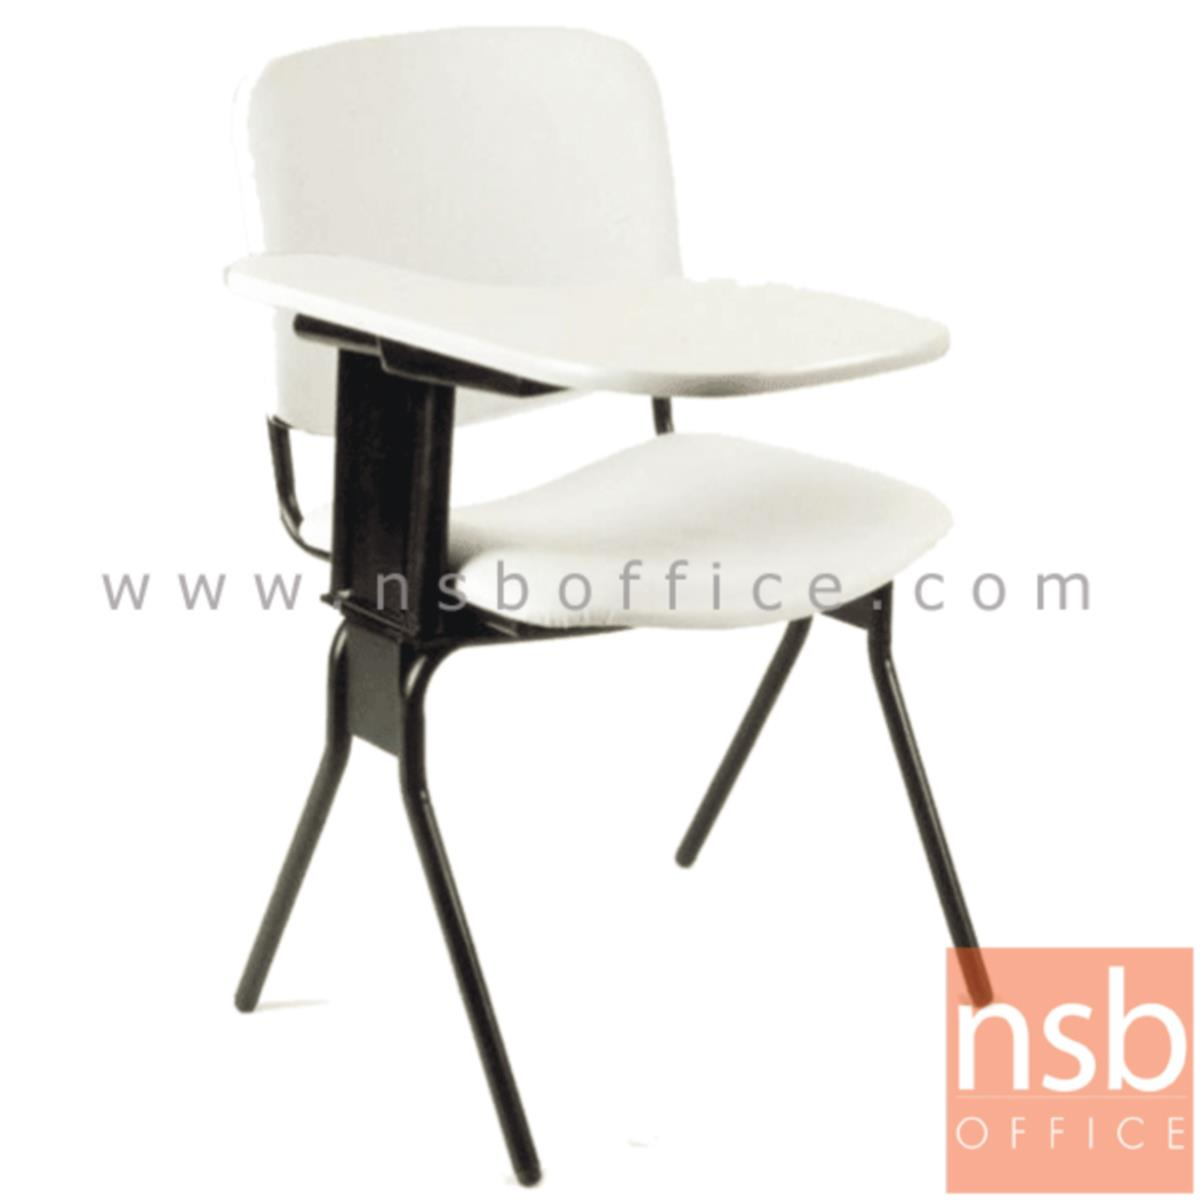 B07A042:เก้าอี้เลคเชอร์หุ้มหนังเทียม (PVC) รุ่น Derwent (เดอเวนท์) ขาเหล็กพ่นดำ